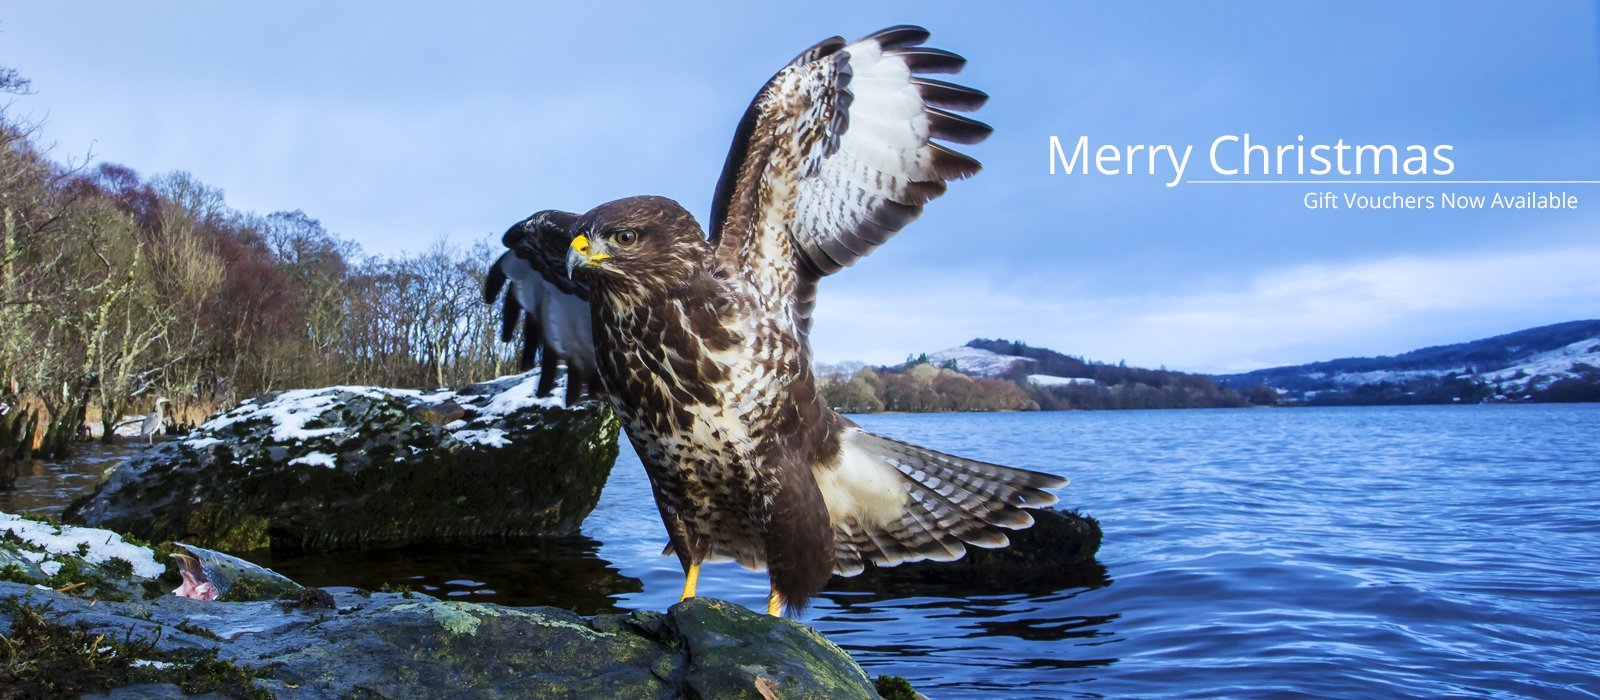 Scottish wildlife photography workshop gift vouchers